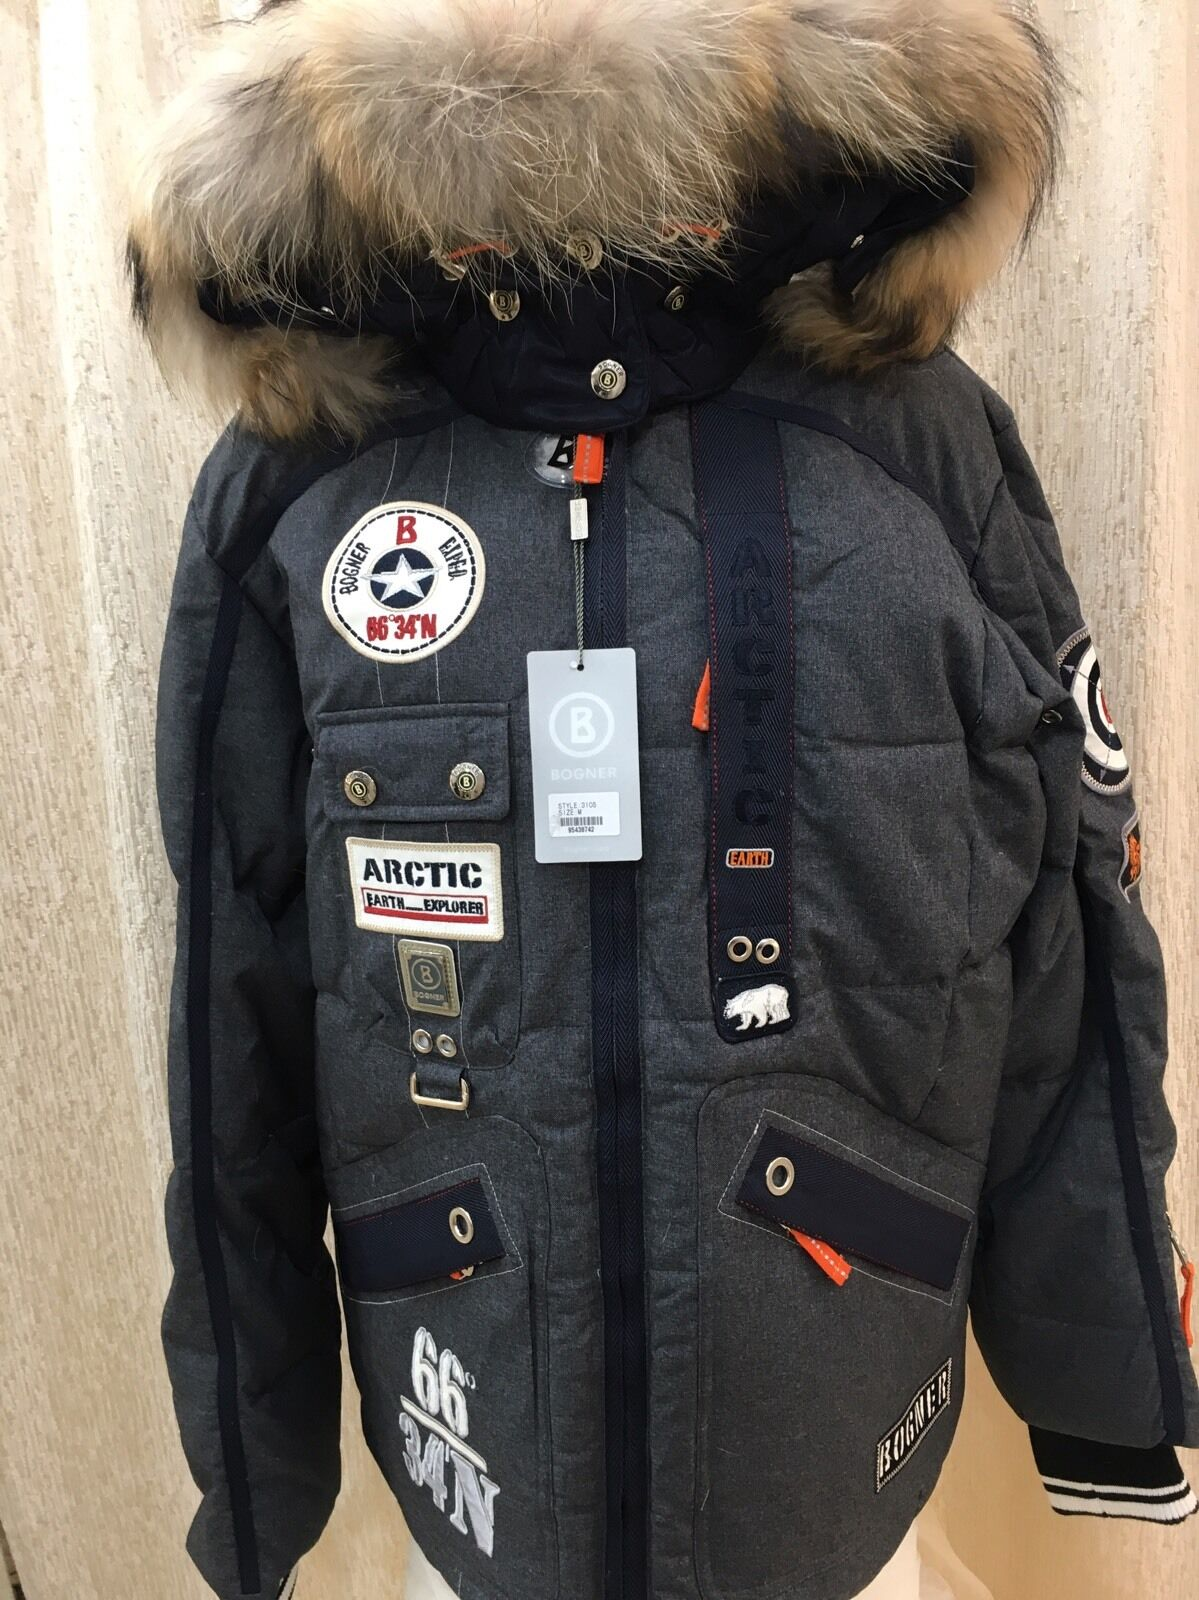 Купить Bogner - Bogner ski jacket Dagur, Down insulated tea wool Mens Winter Size EU 52, 42 US L